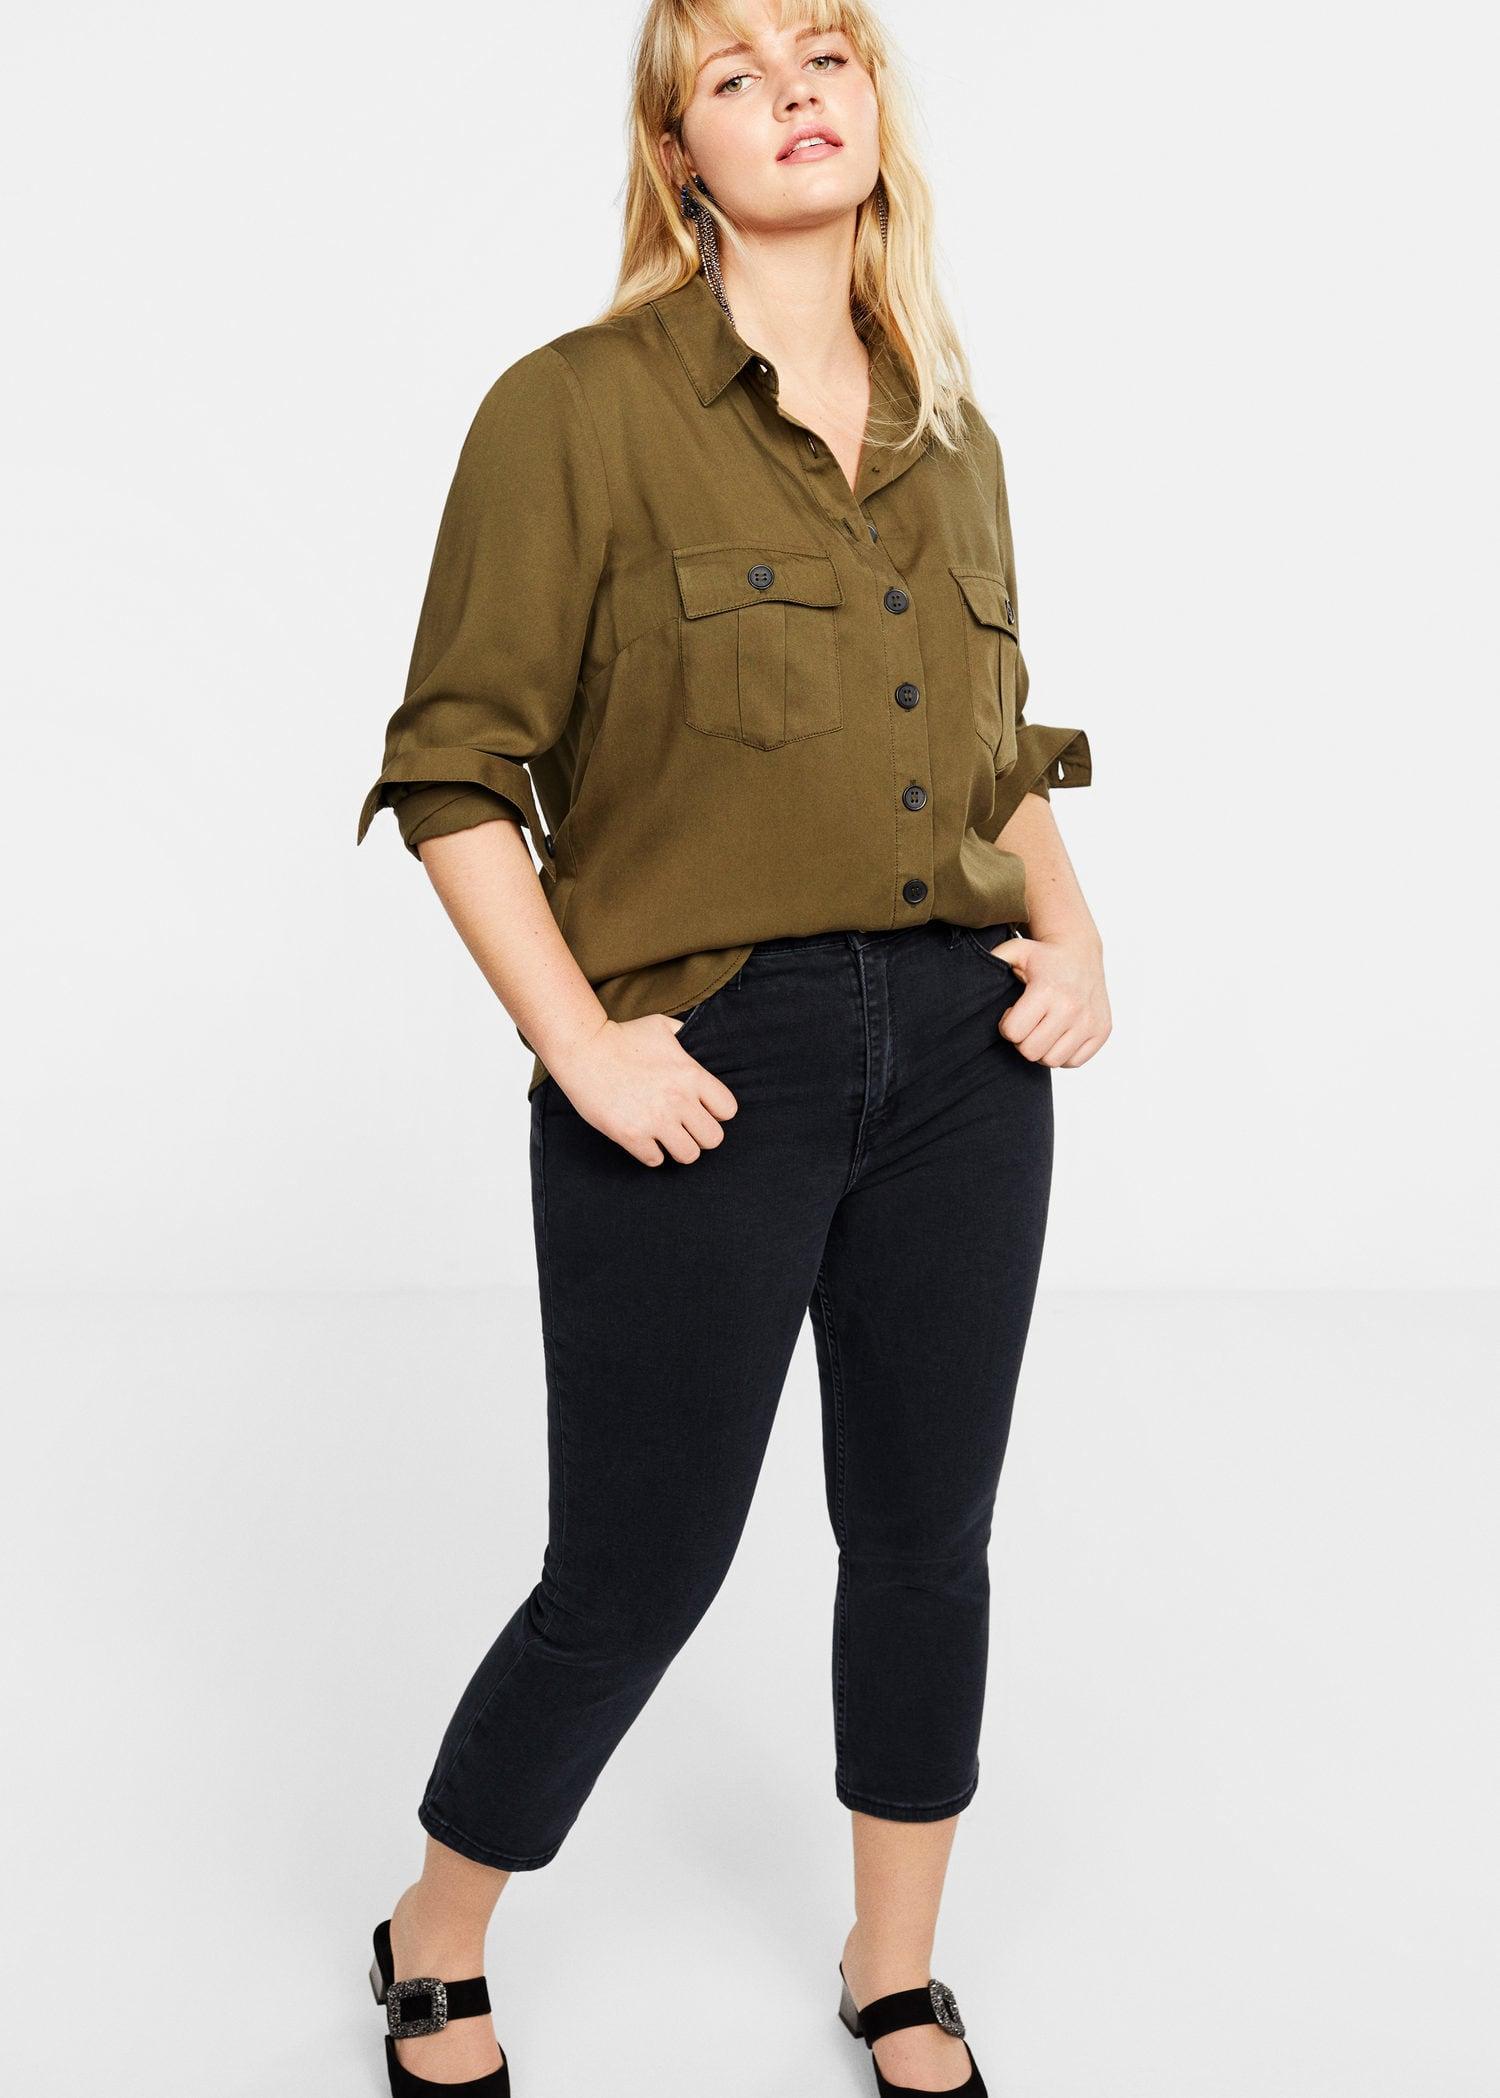 d02ab7d4ca5e Violeta by Mango Jandri Boot Cropped Jeans in Black - Lyst